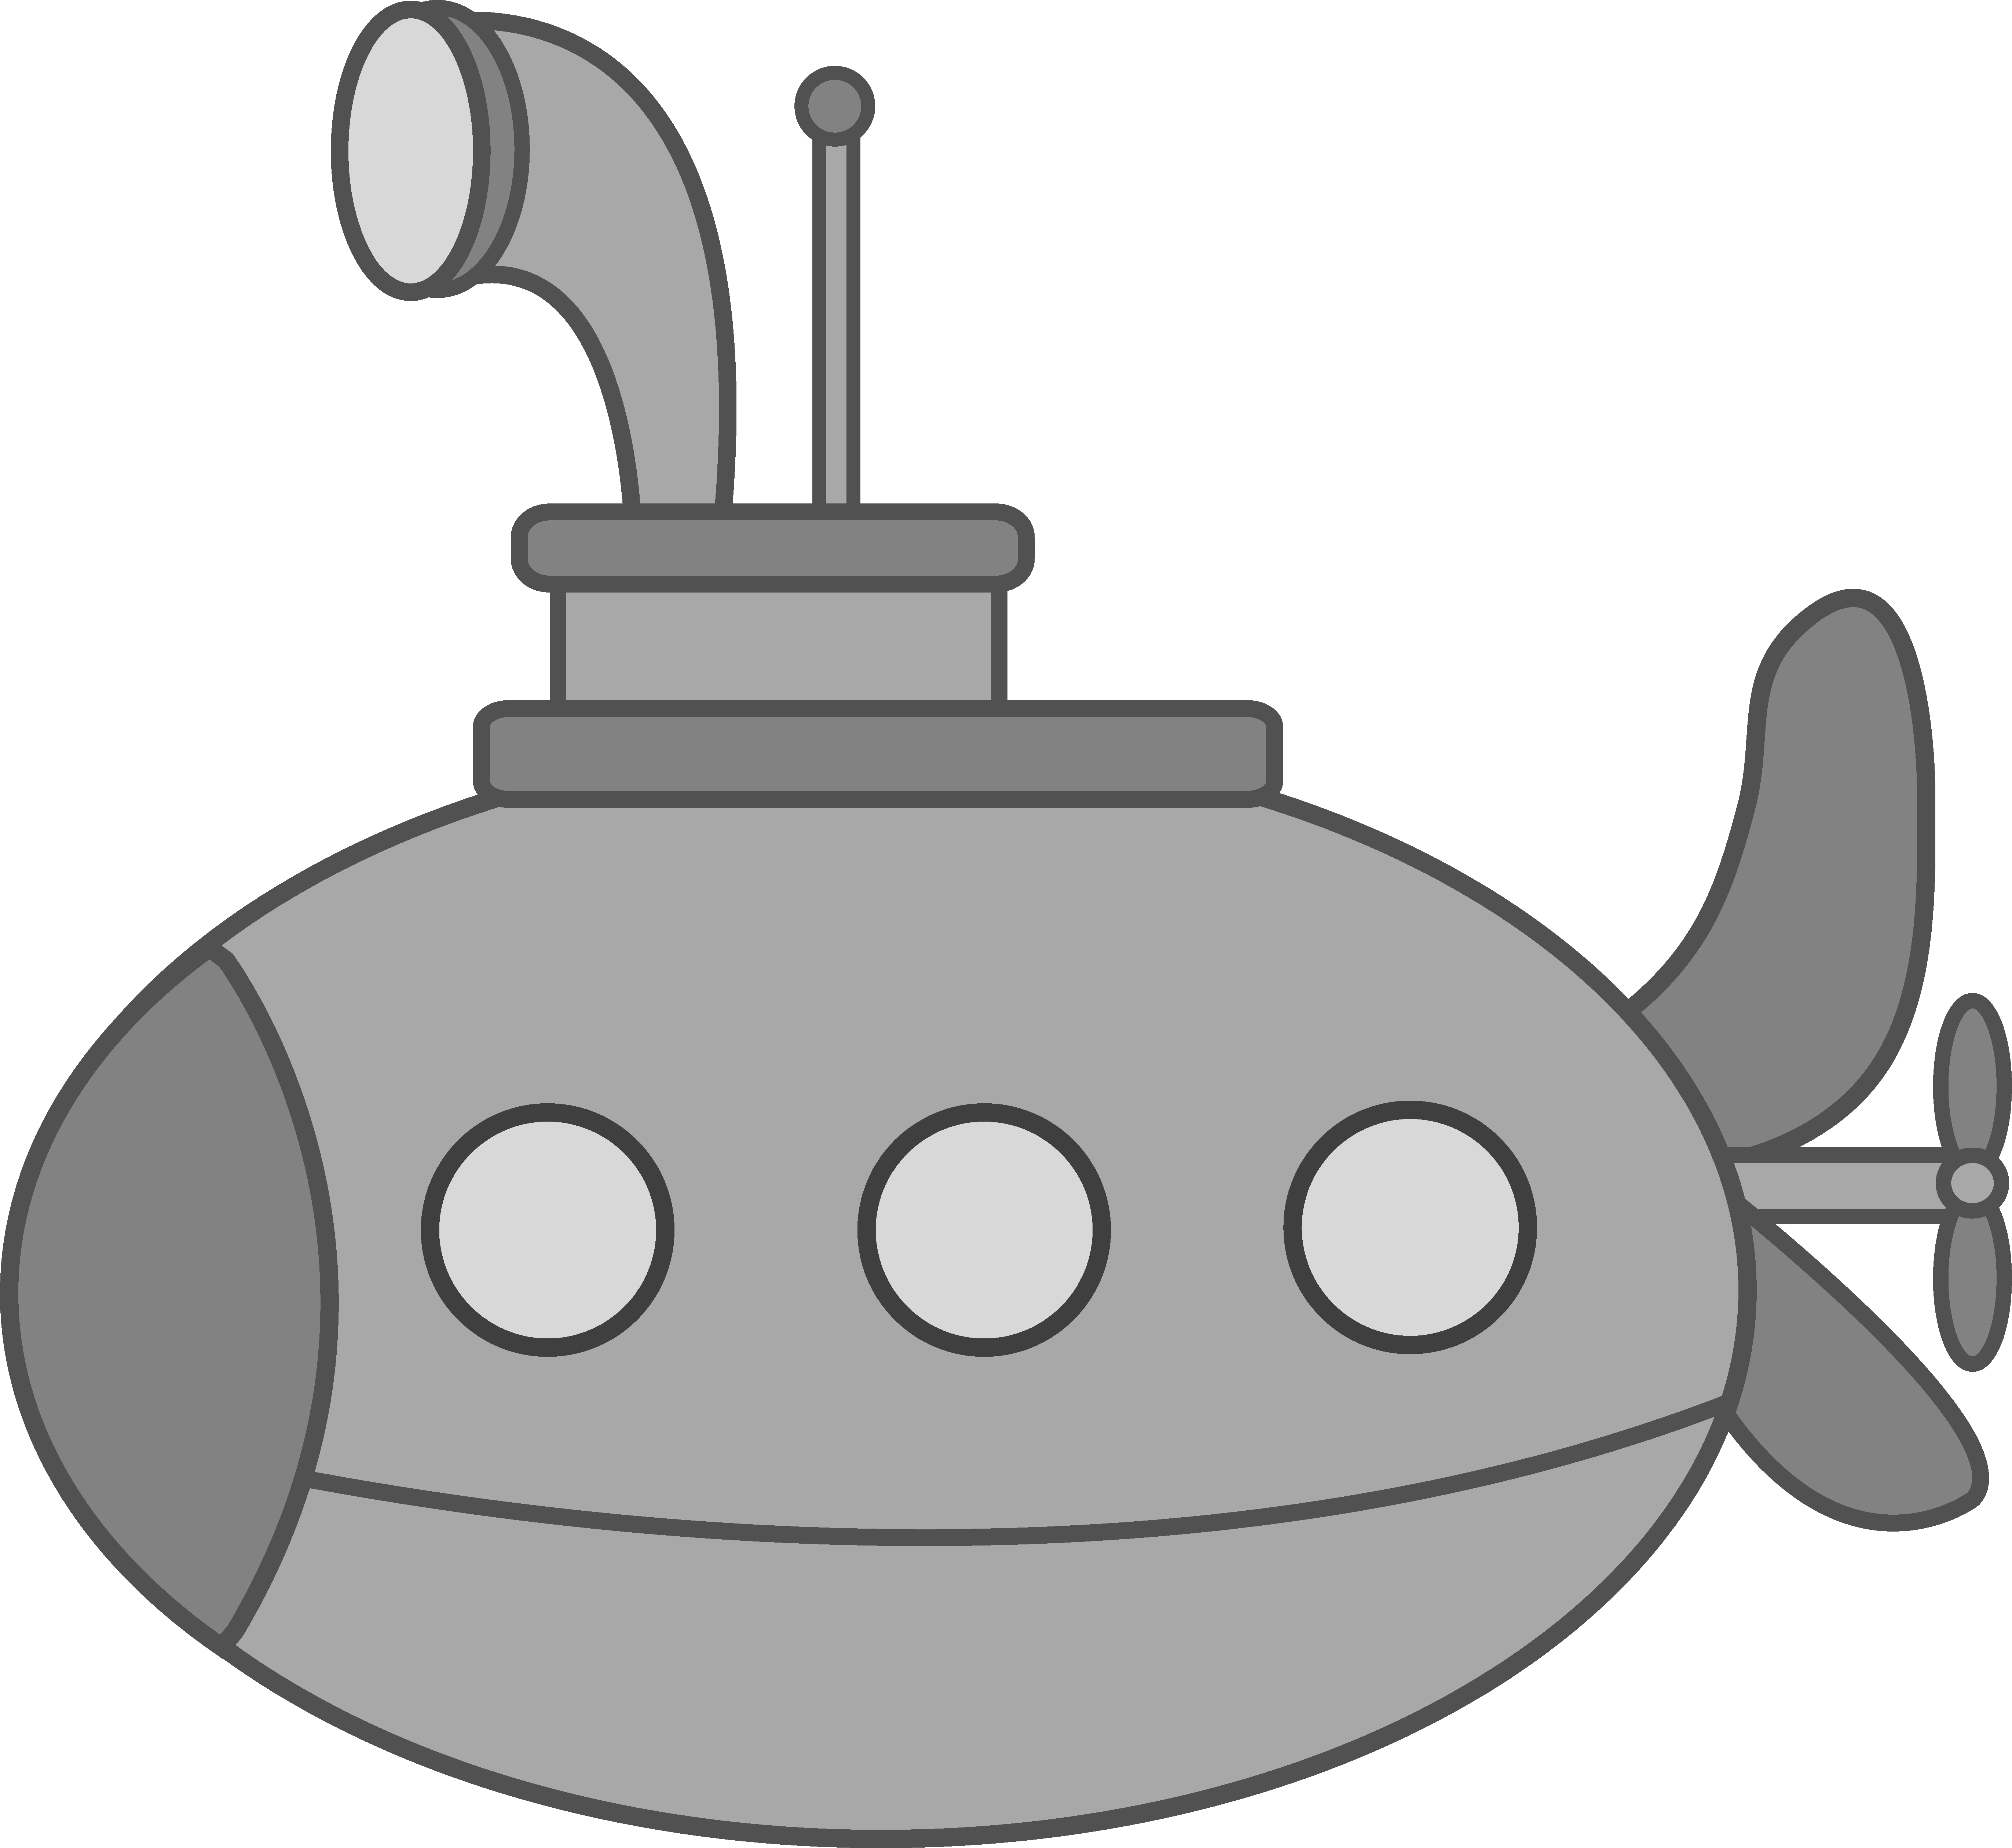 Submarine Clipart - Cliparts.co